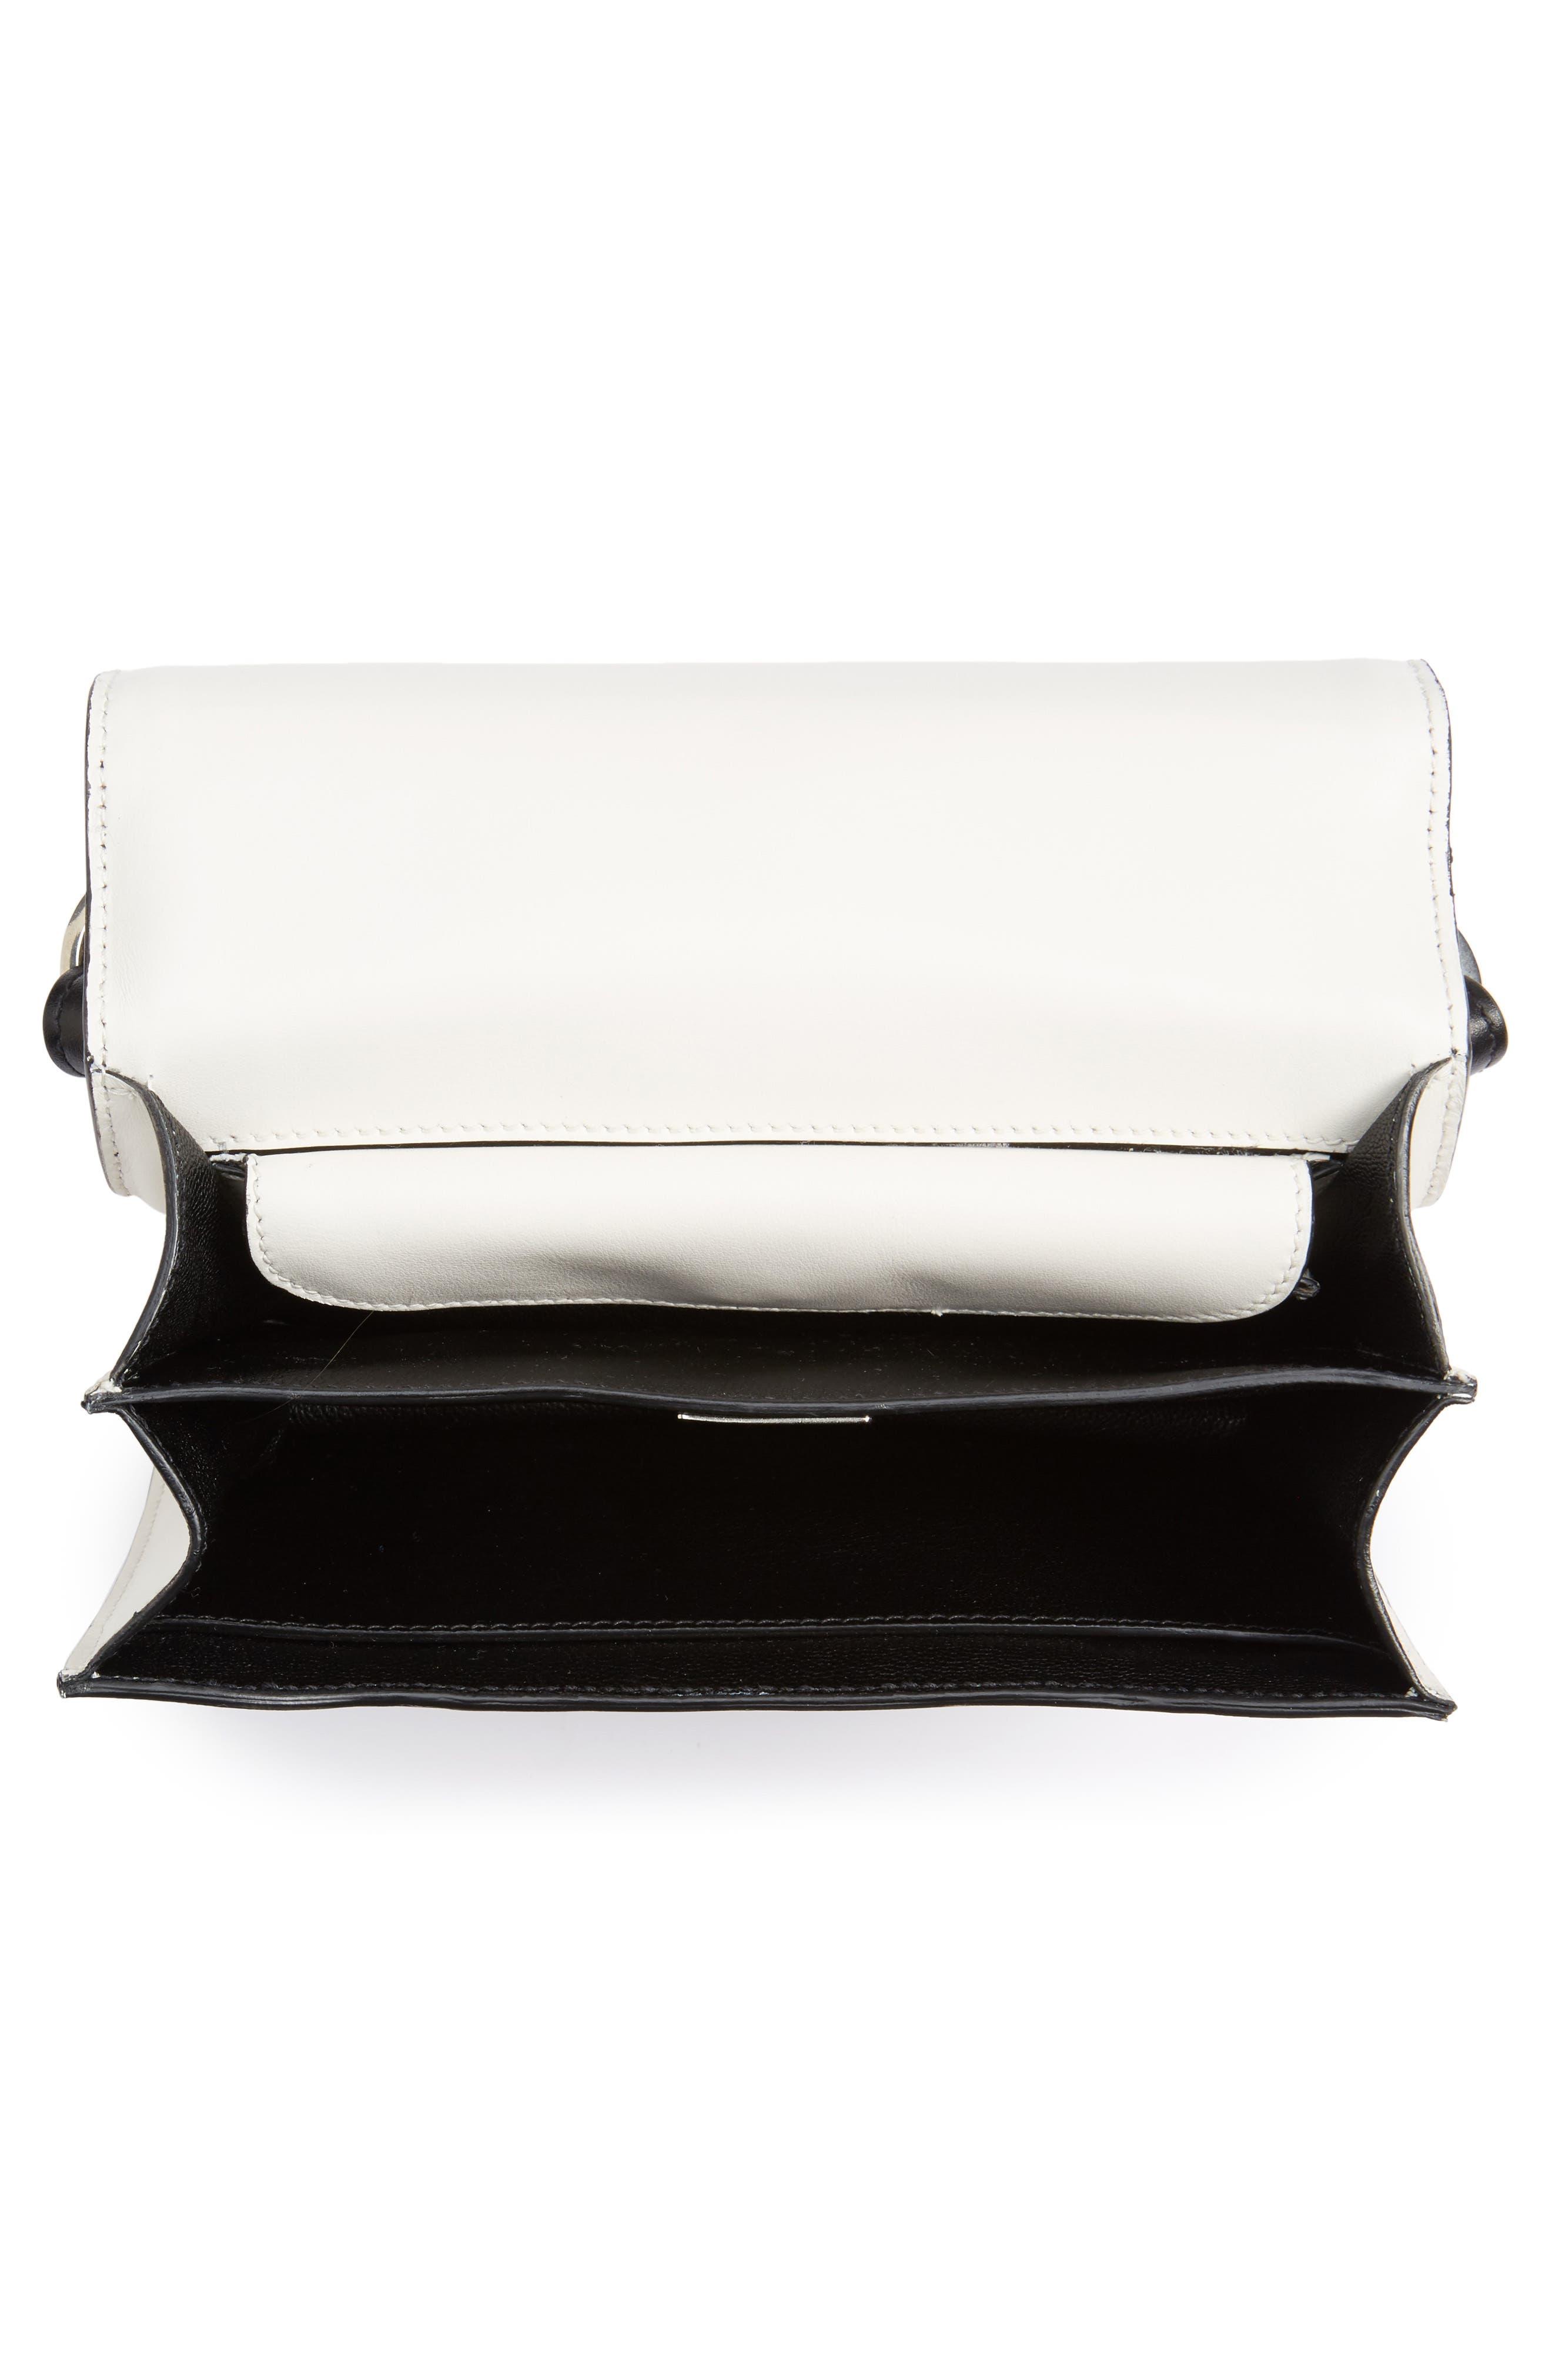 Cahier City Calfskin Shoulder Bag,                             Alternate thumbnail 4, color,                             Bianco/ Nero